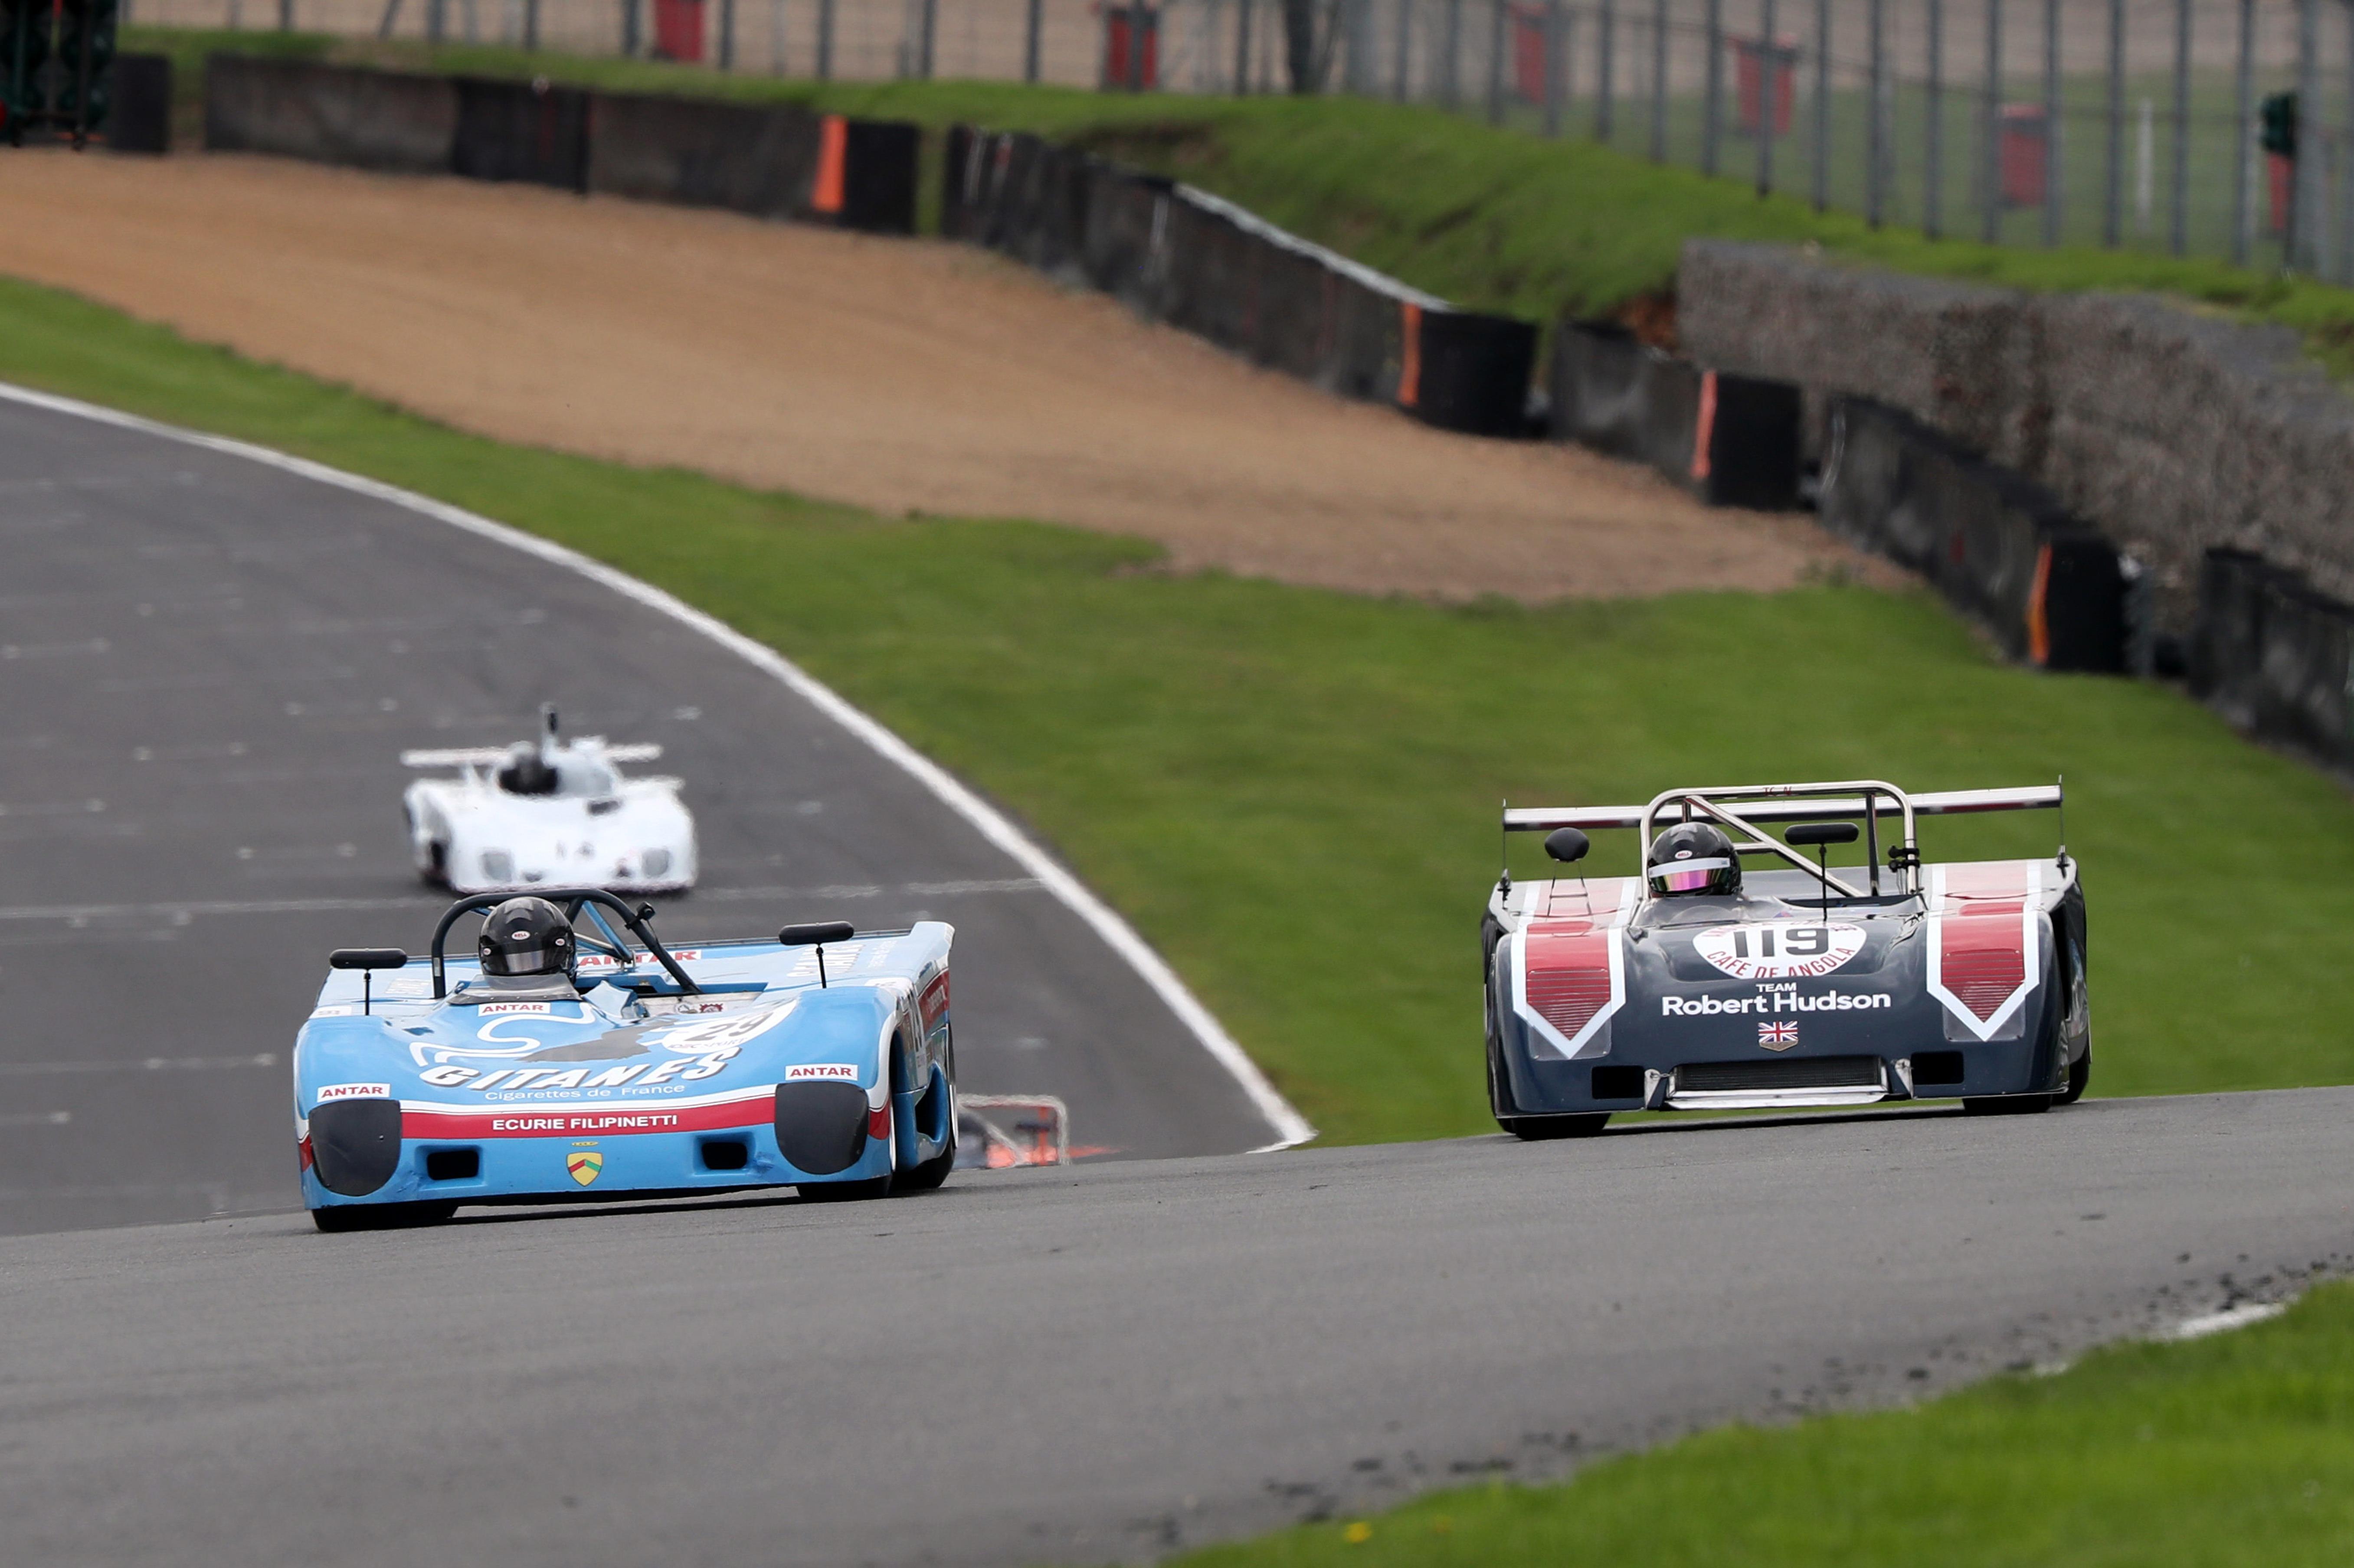 Mark Richardson (Lola T290), James Claridge (Chevron B23), Thundersports, Brands Hatch 2021